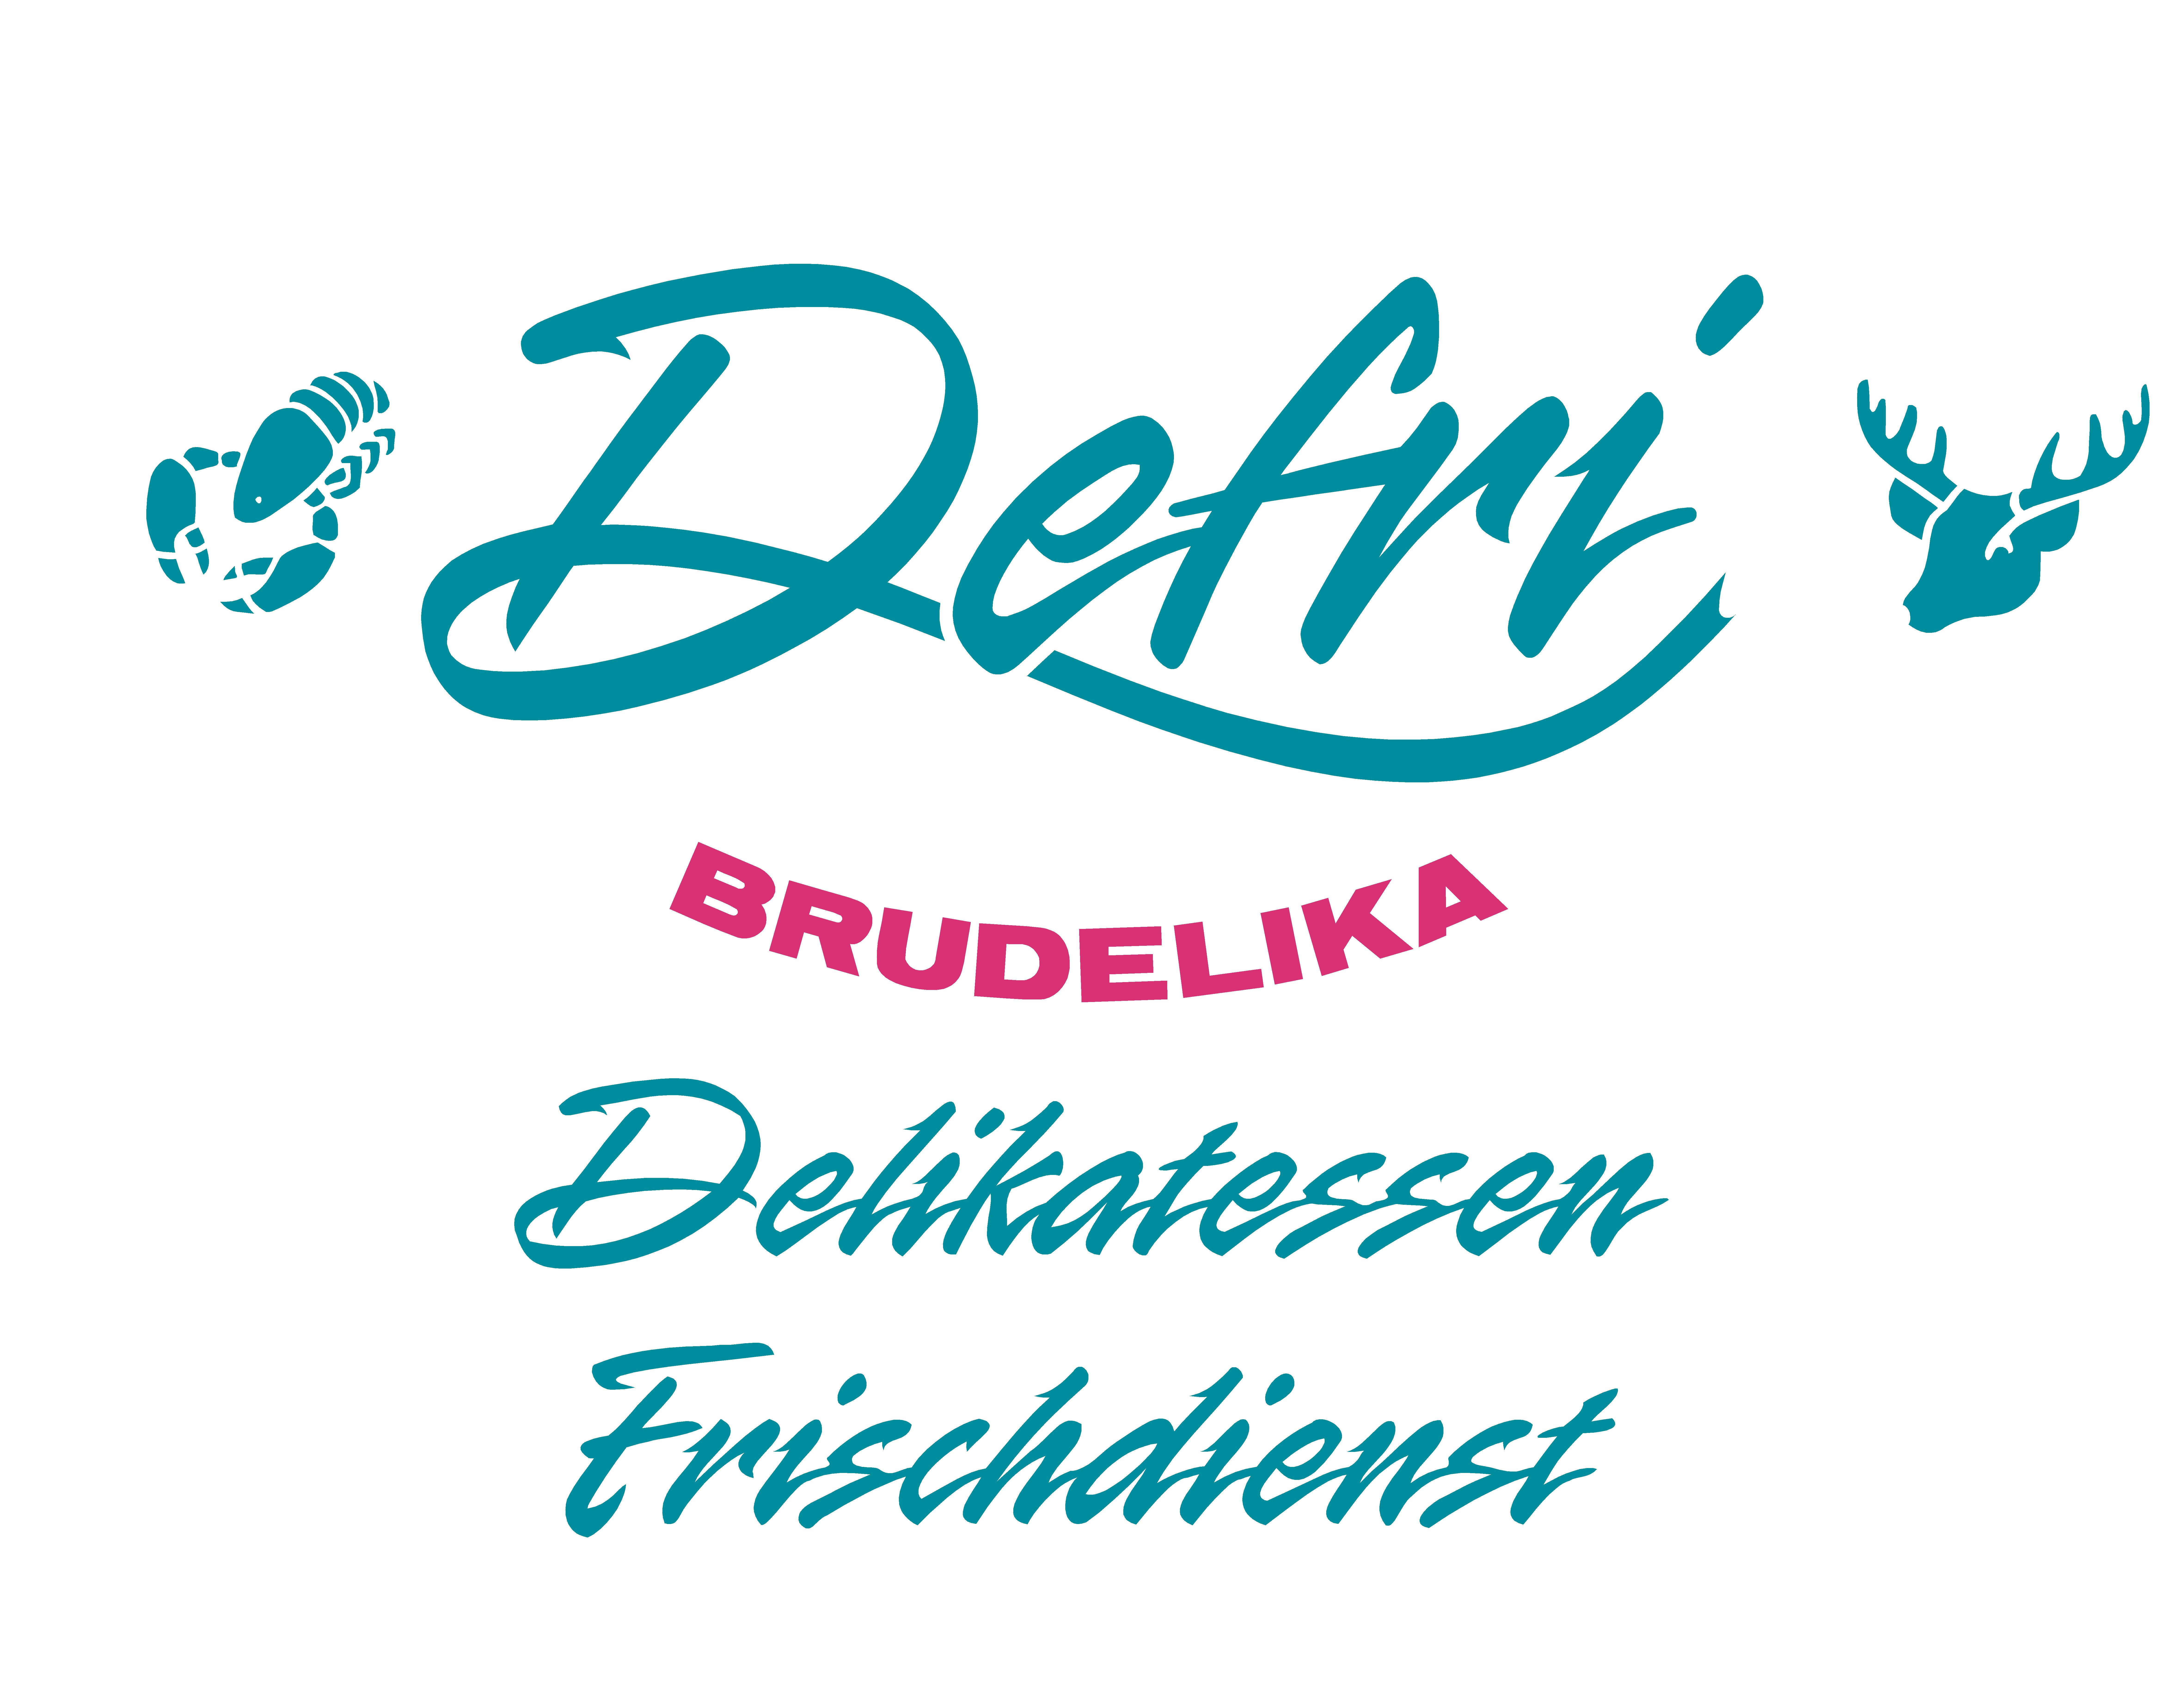 DEFRI Brudelika GmbH